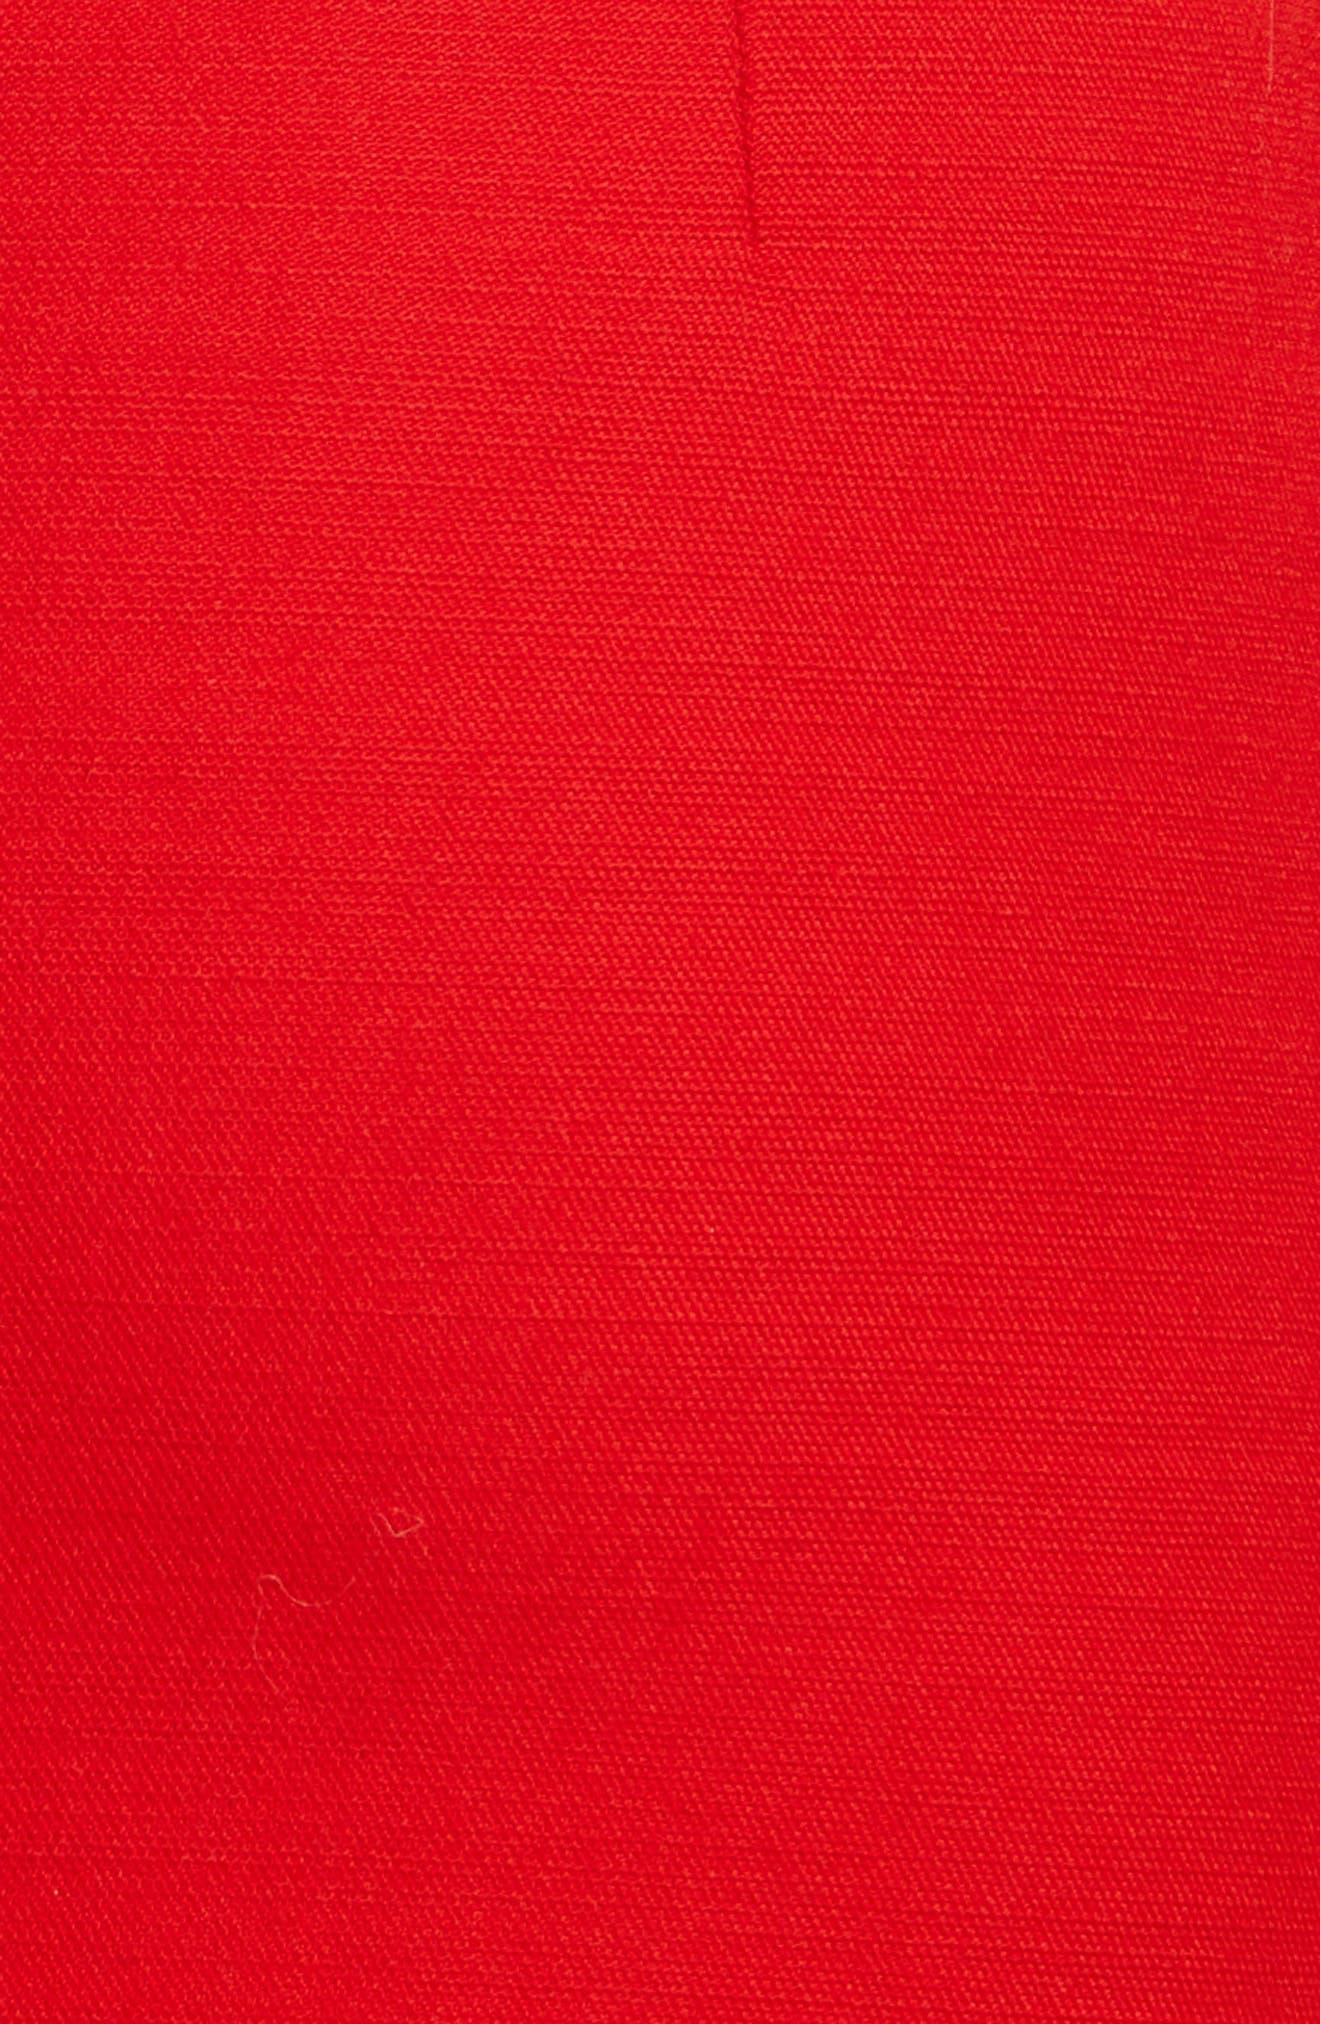 Double Face Wool & Silk Dress,                             Alternate thumbnail 5, color,                             600